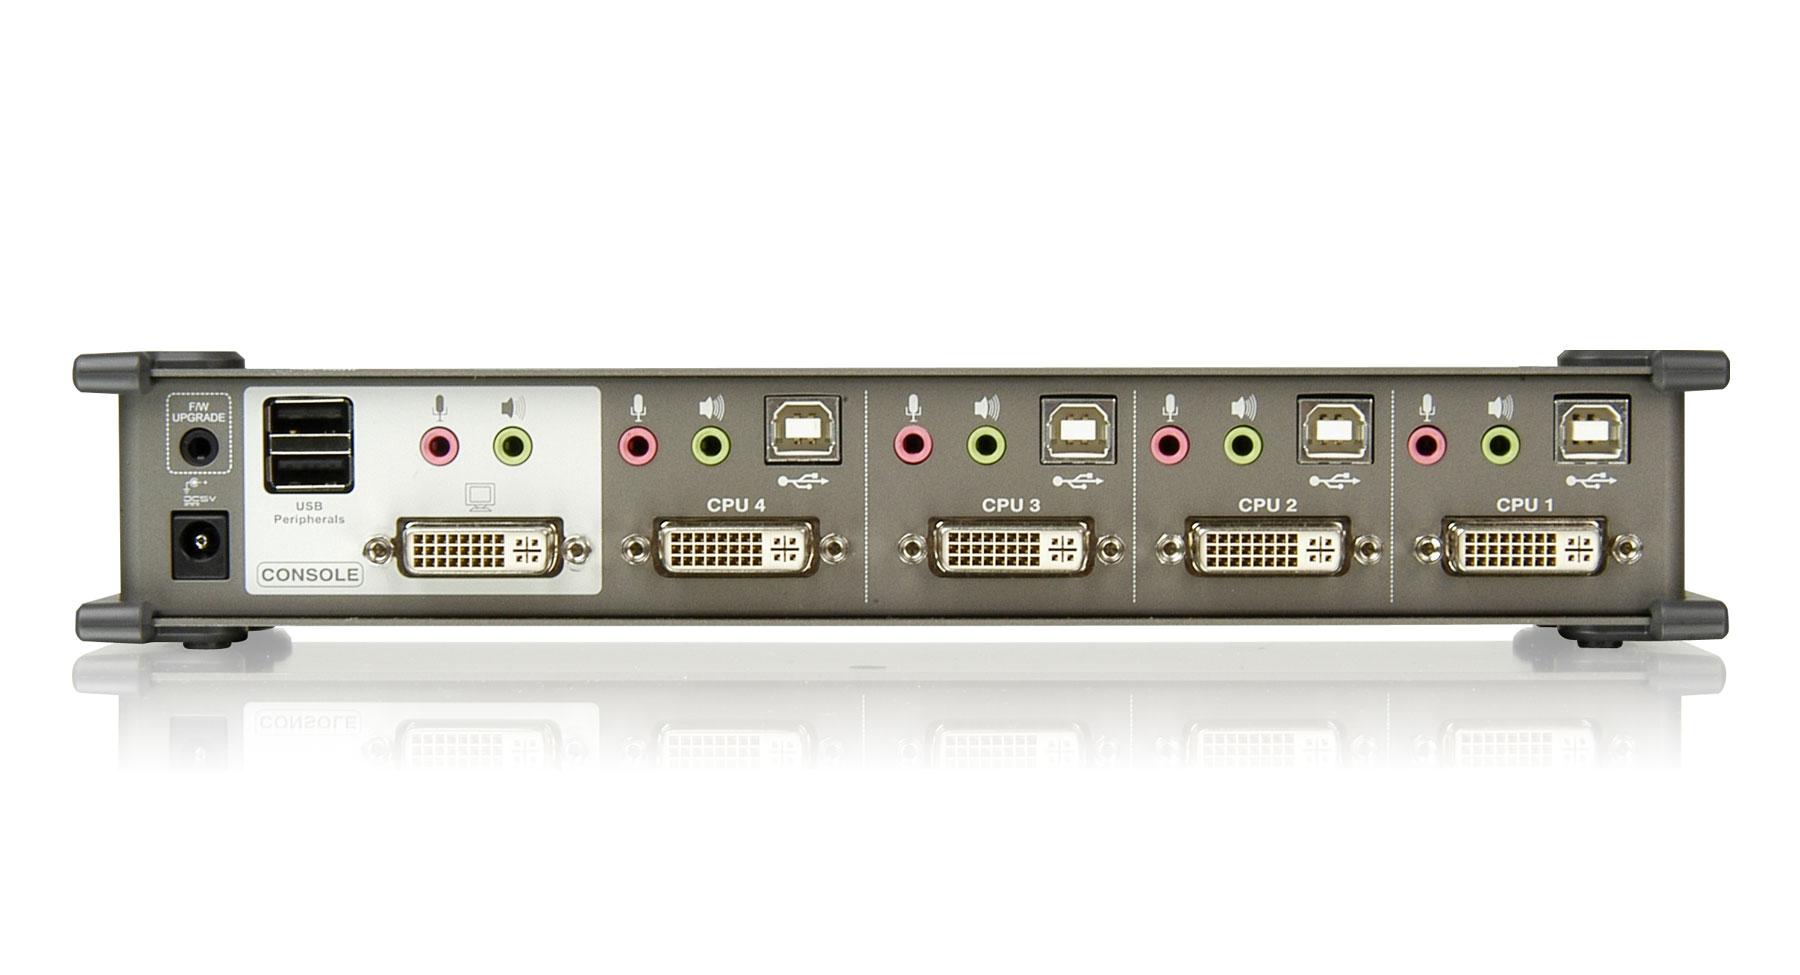 Iogear Gcs1764 4 Port Dvi Kvmp Switch With Audio And